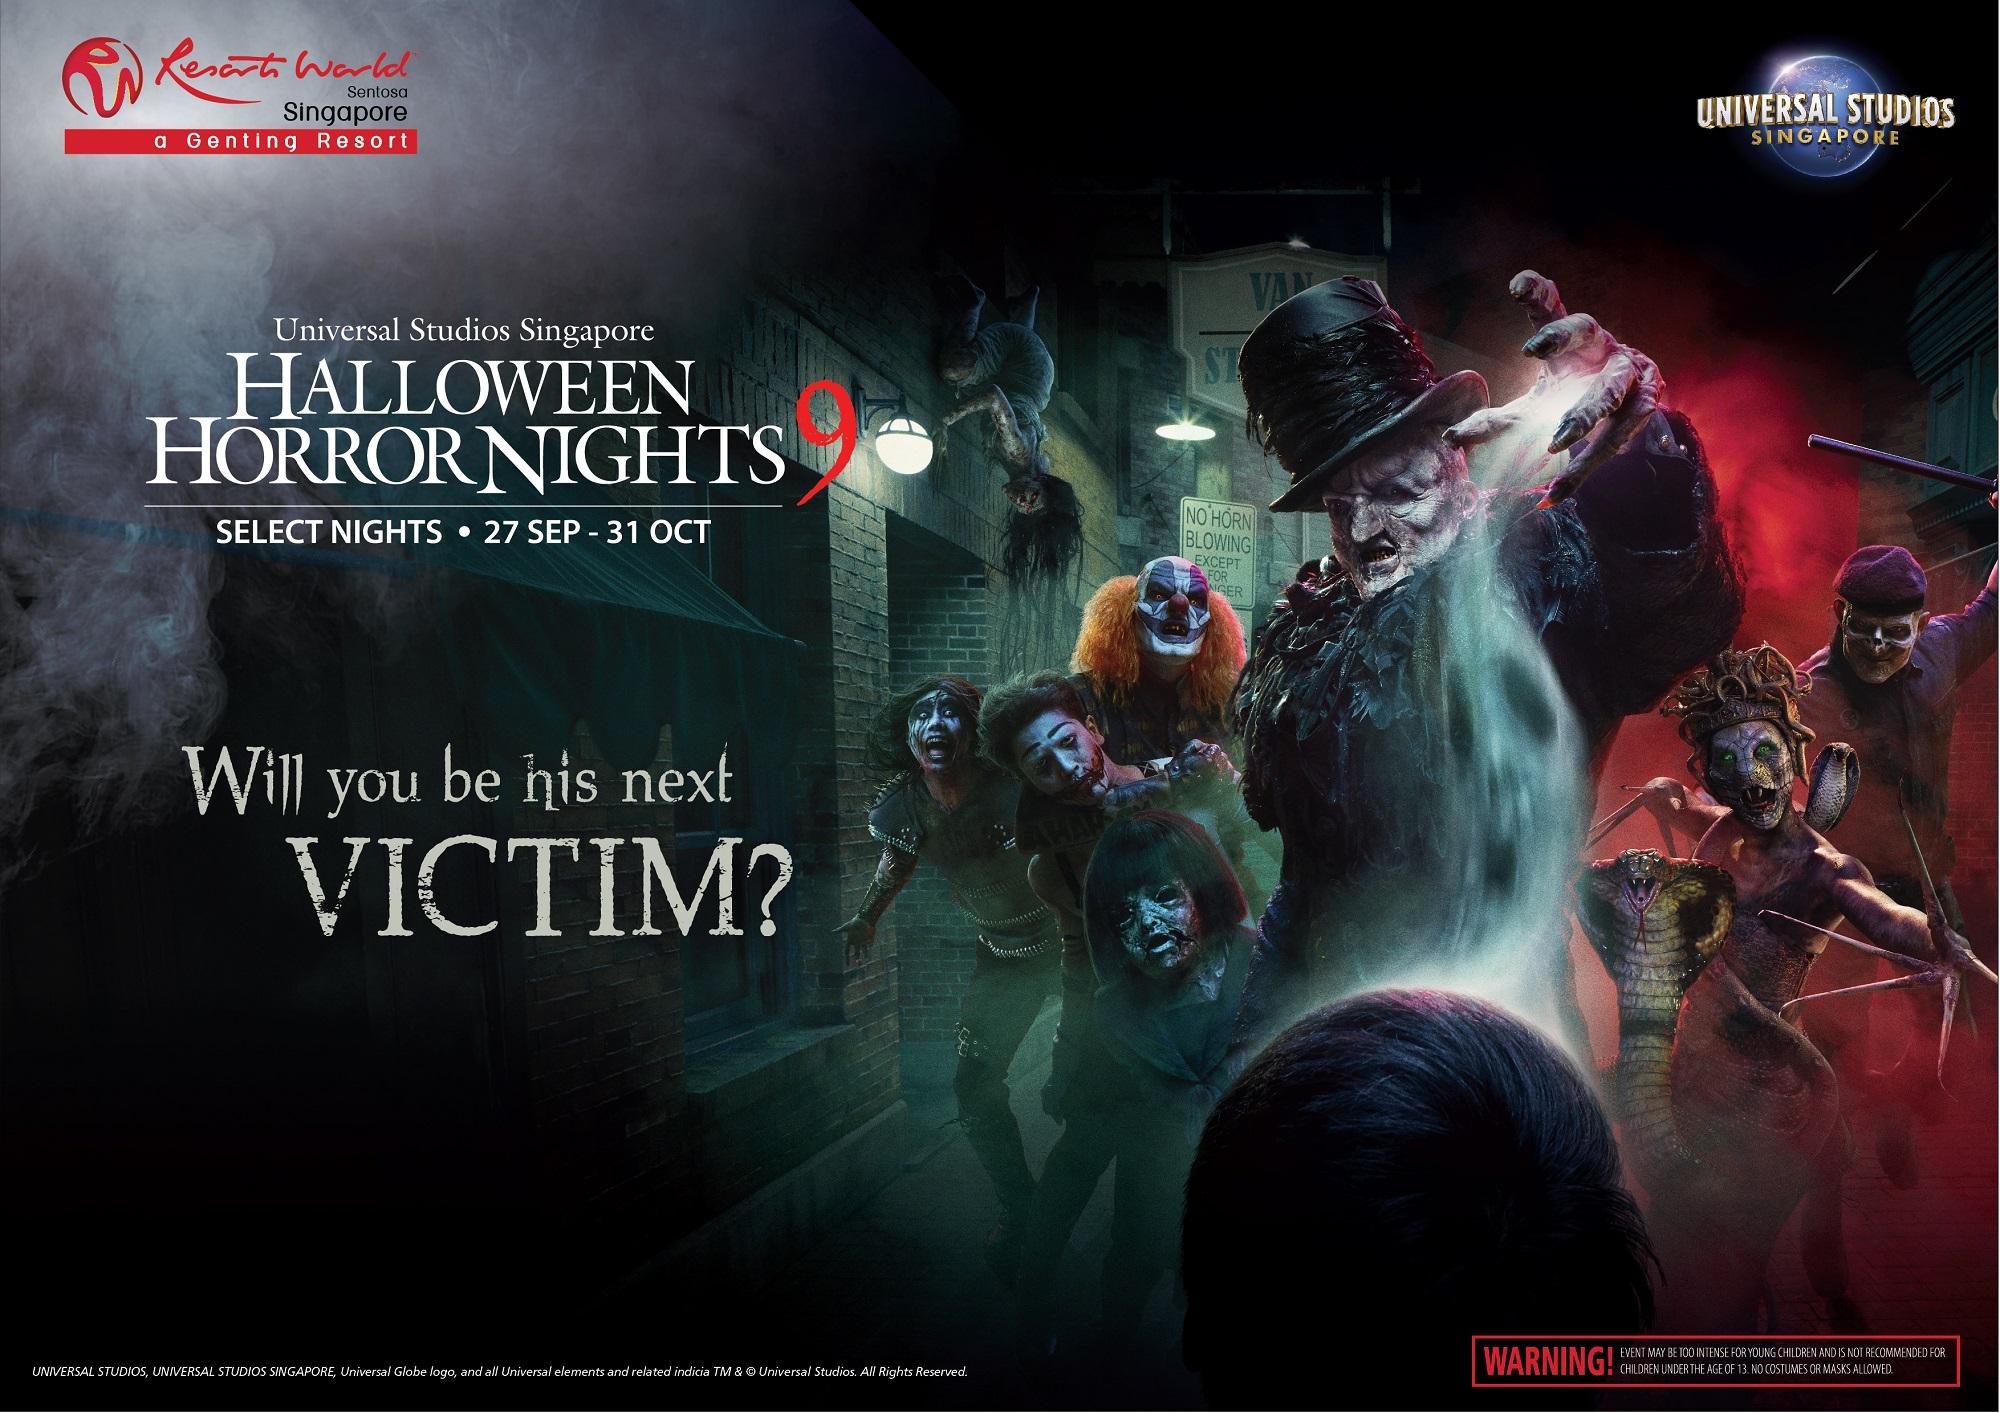 Halloween Horror Nights 2020 Japan Universal Studios Singapore's Halloween Horror Nights returns for